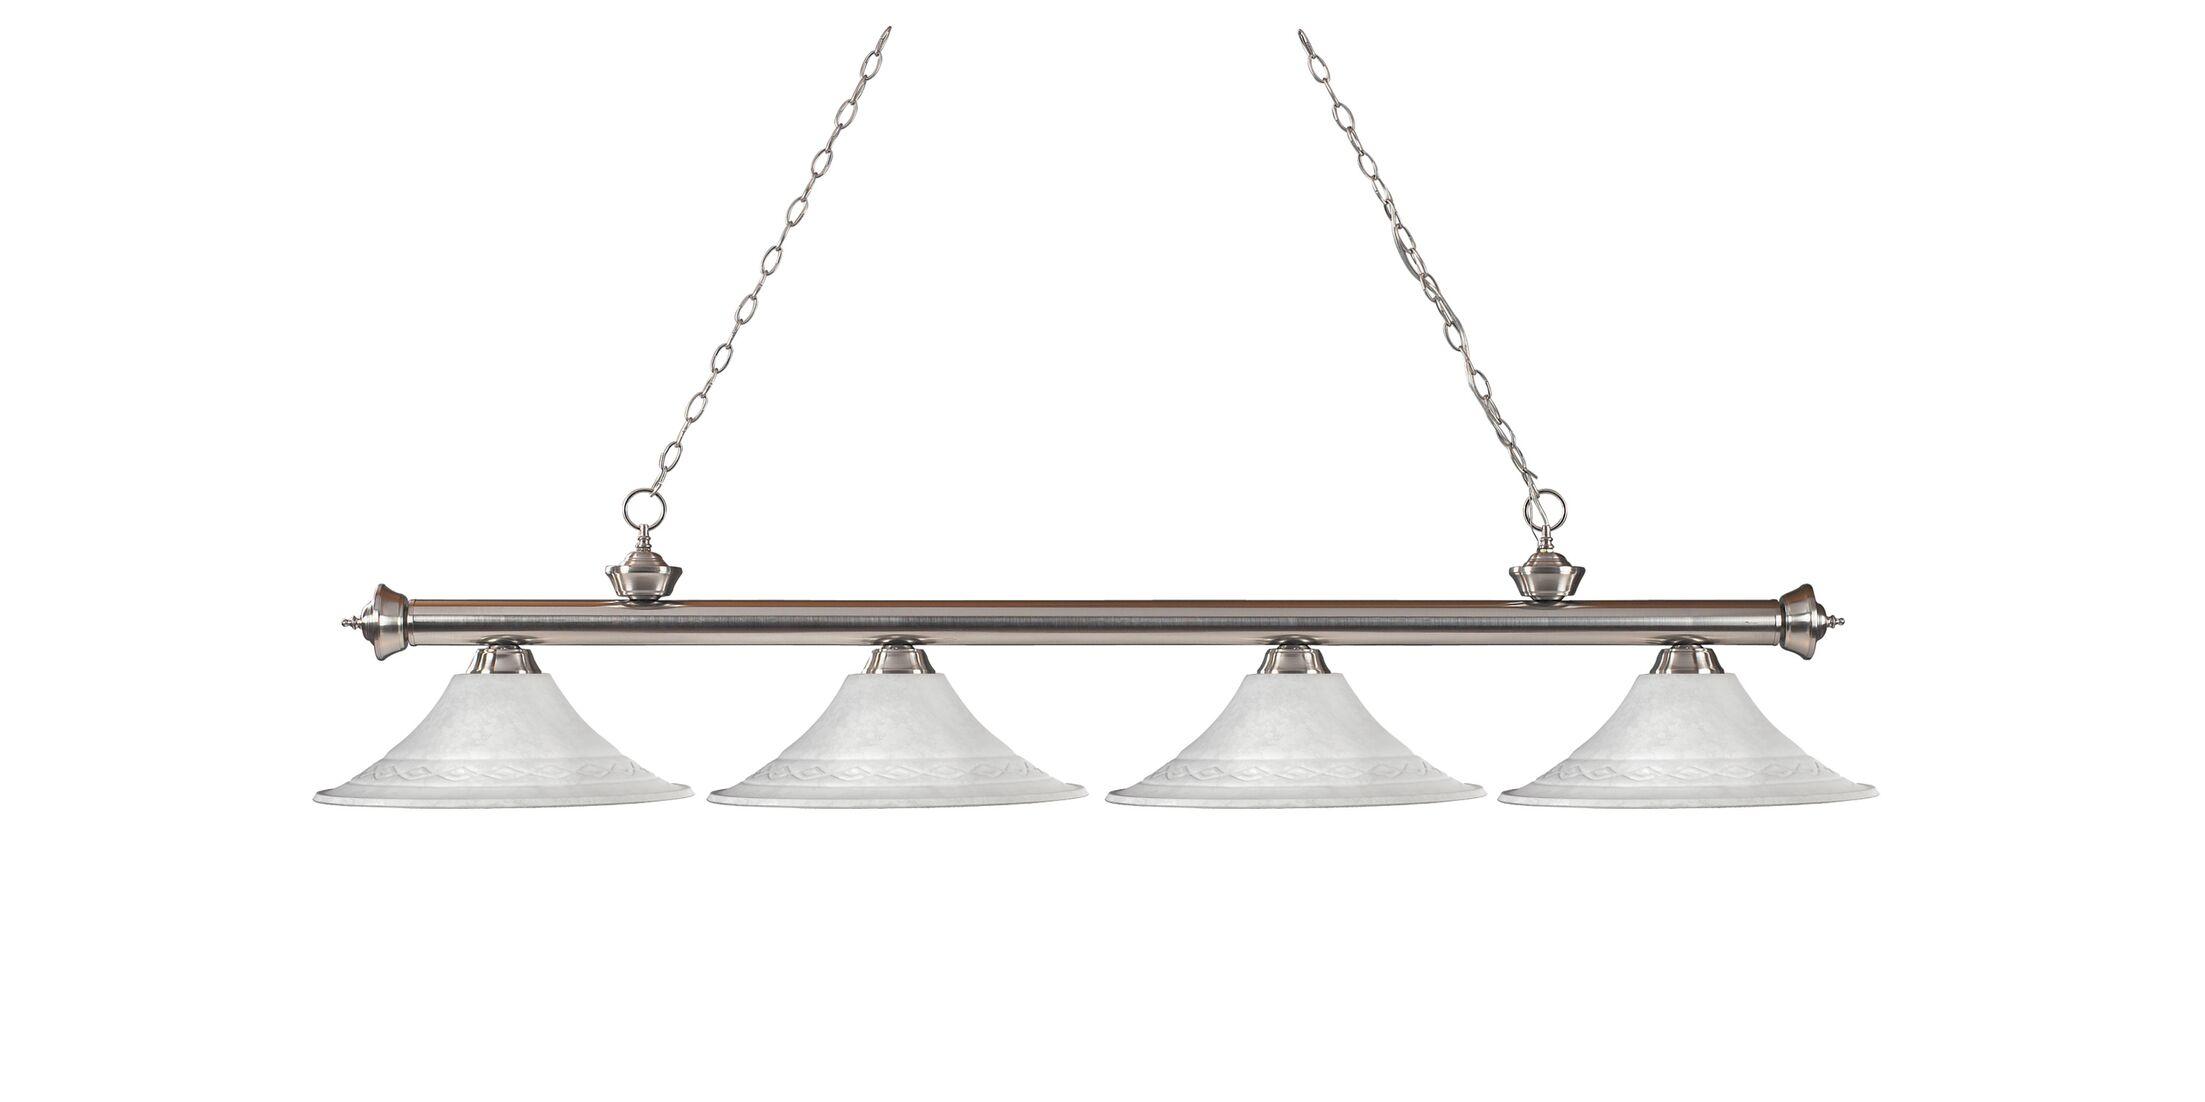 Zephyr 4-Light Cone Glass Shade Billiard Light